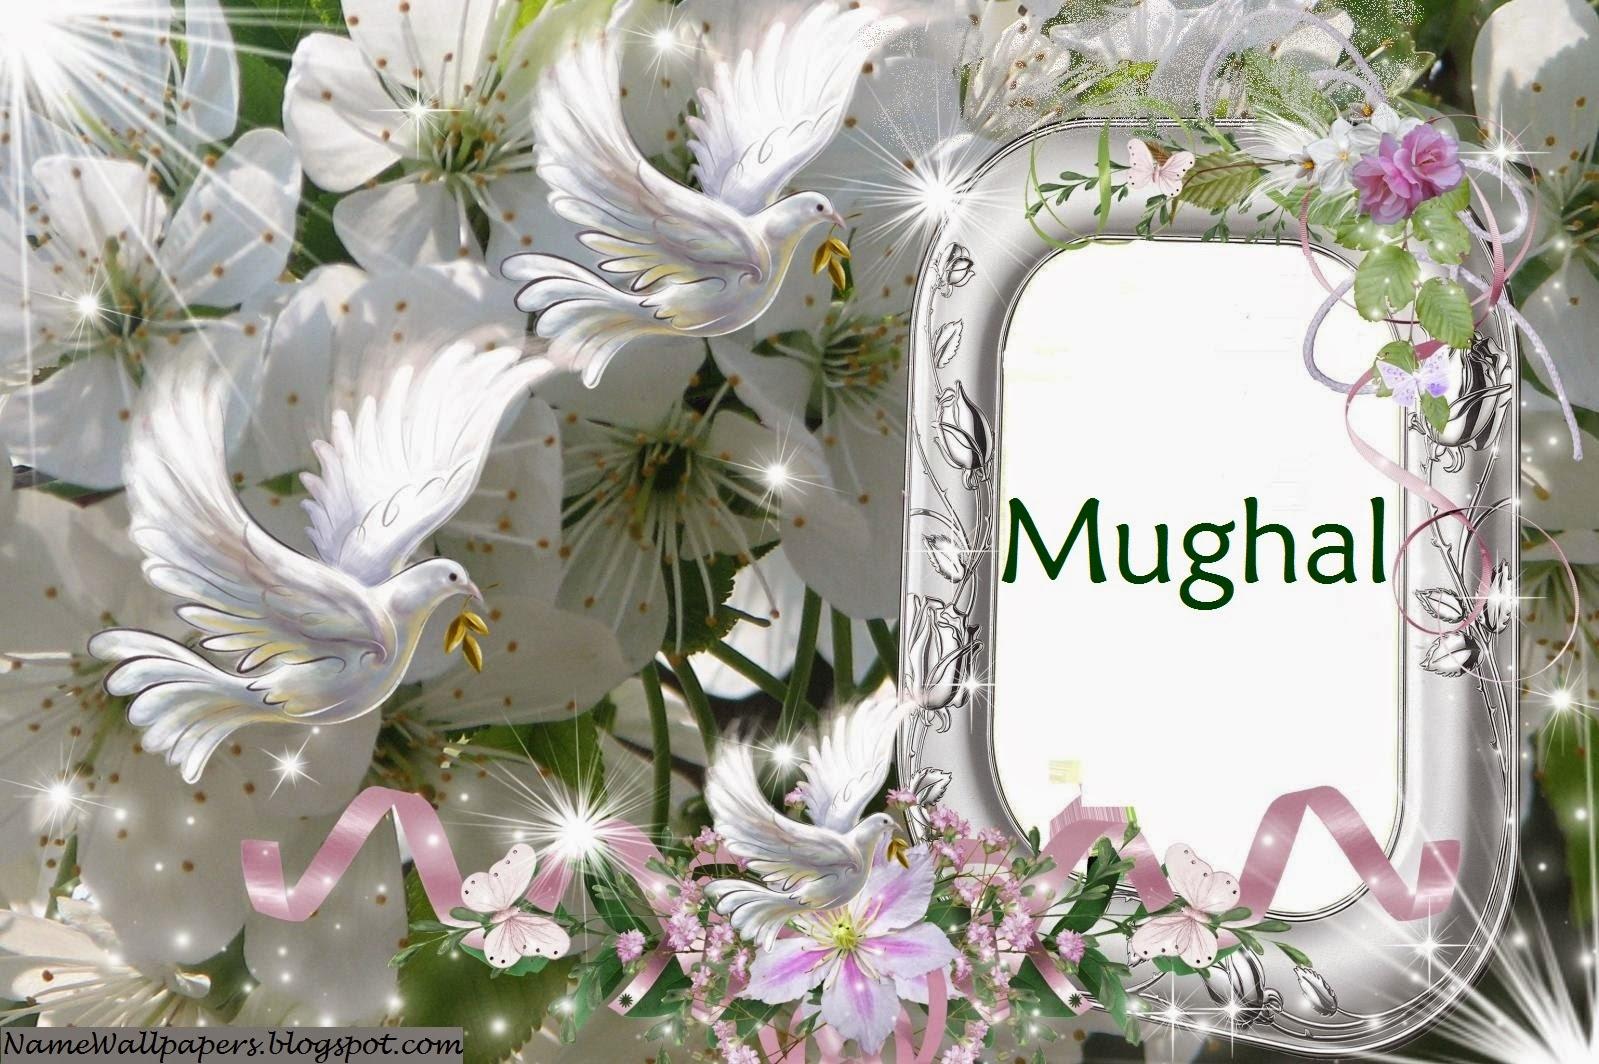 3D Name Wallpaper 1 Source Mughal Wallpapers Urdu Meaning